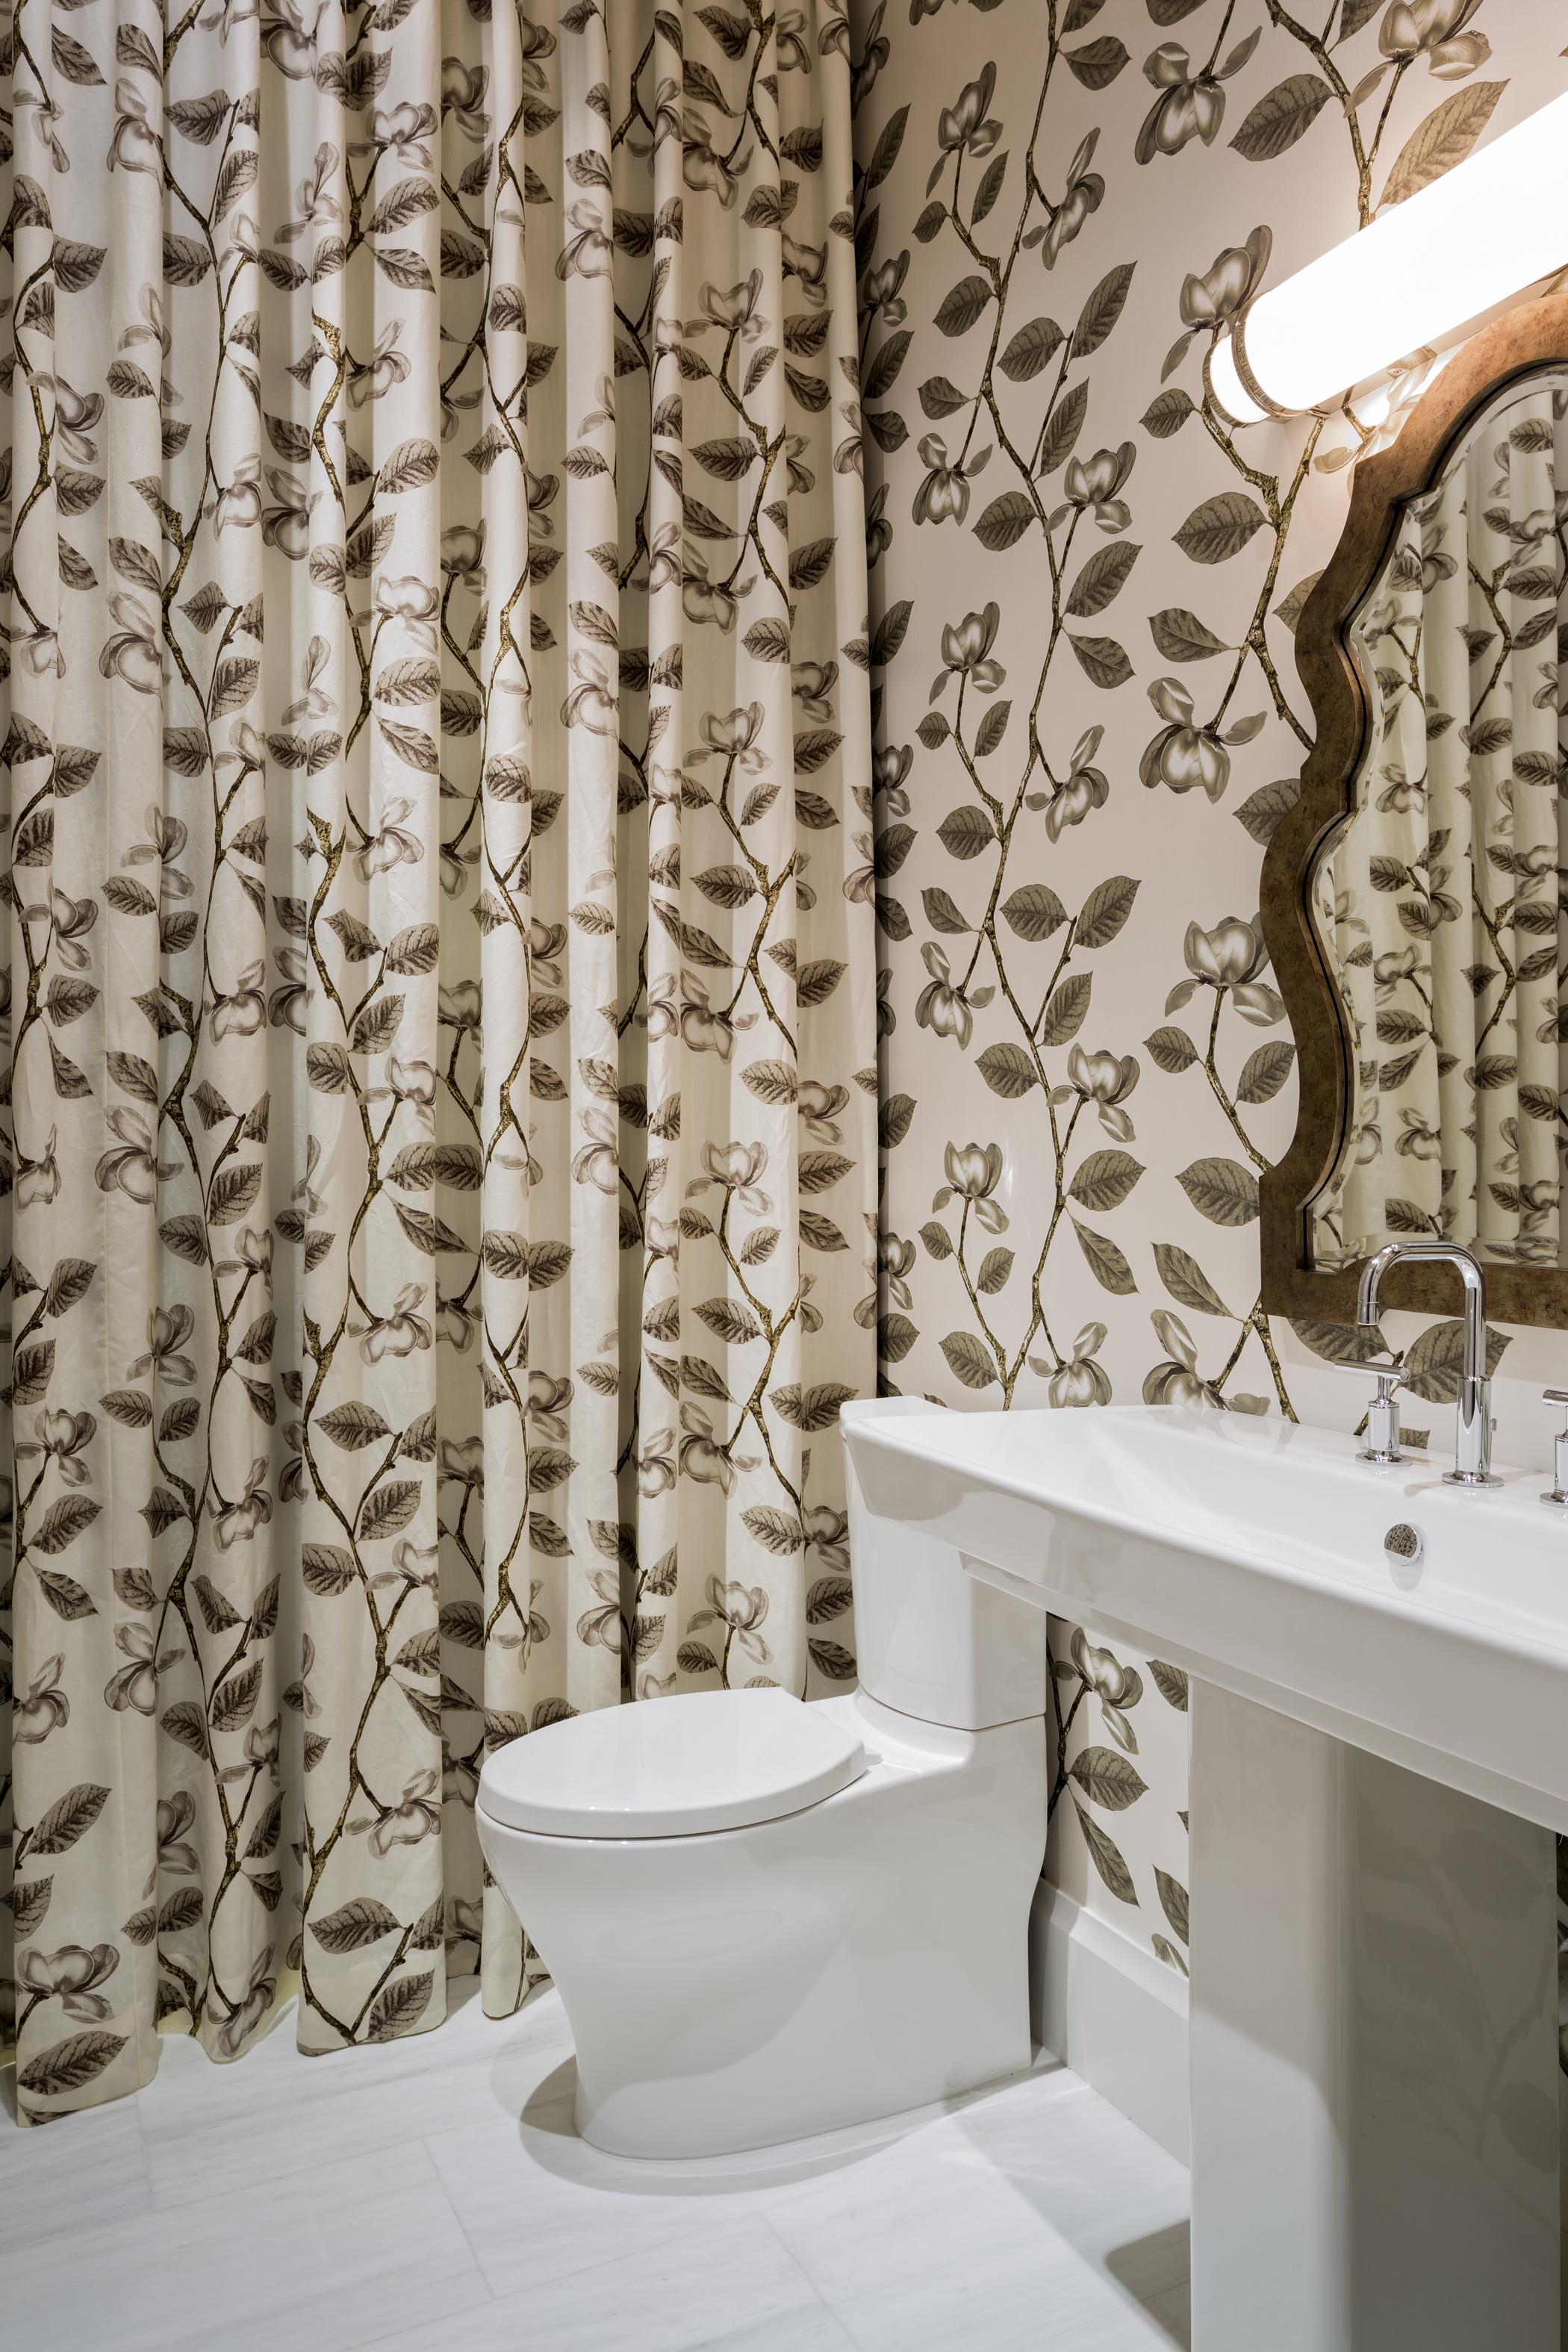 Jeffrey Fisher Home Luxury Interior Design Imagined Home Decor Custom Bathroom